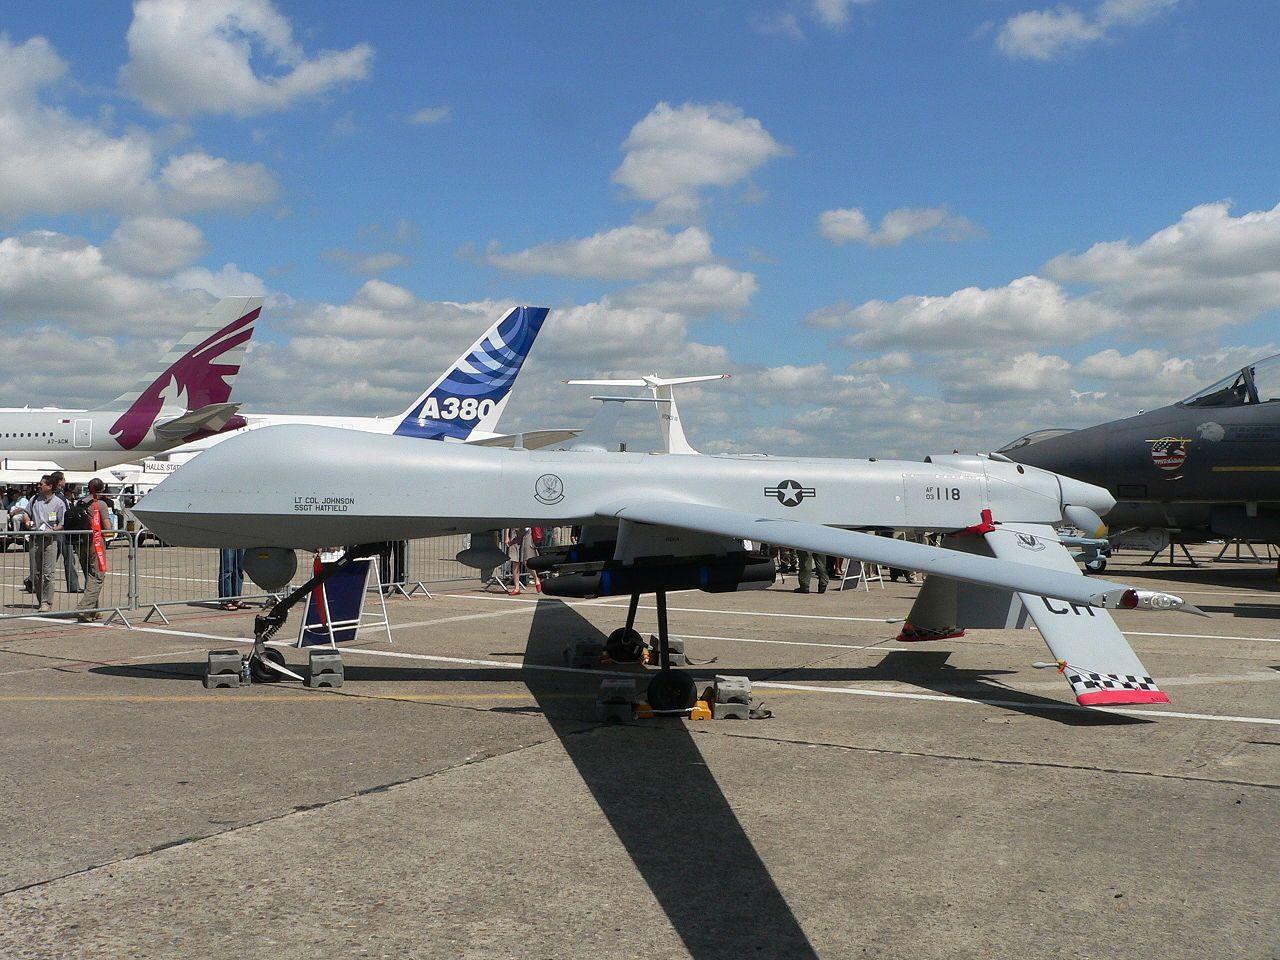 Mq 1 Predator Fot Wikiwand Com En General Atomics Mq 1 Predator Military Drone Unmanned Aerial Vehicle Predator